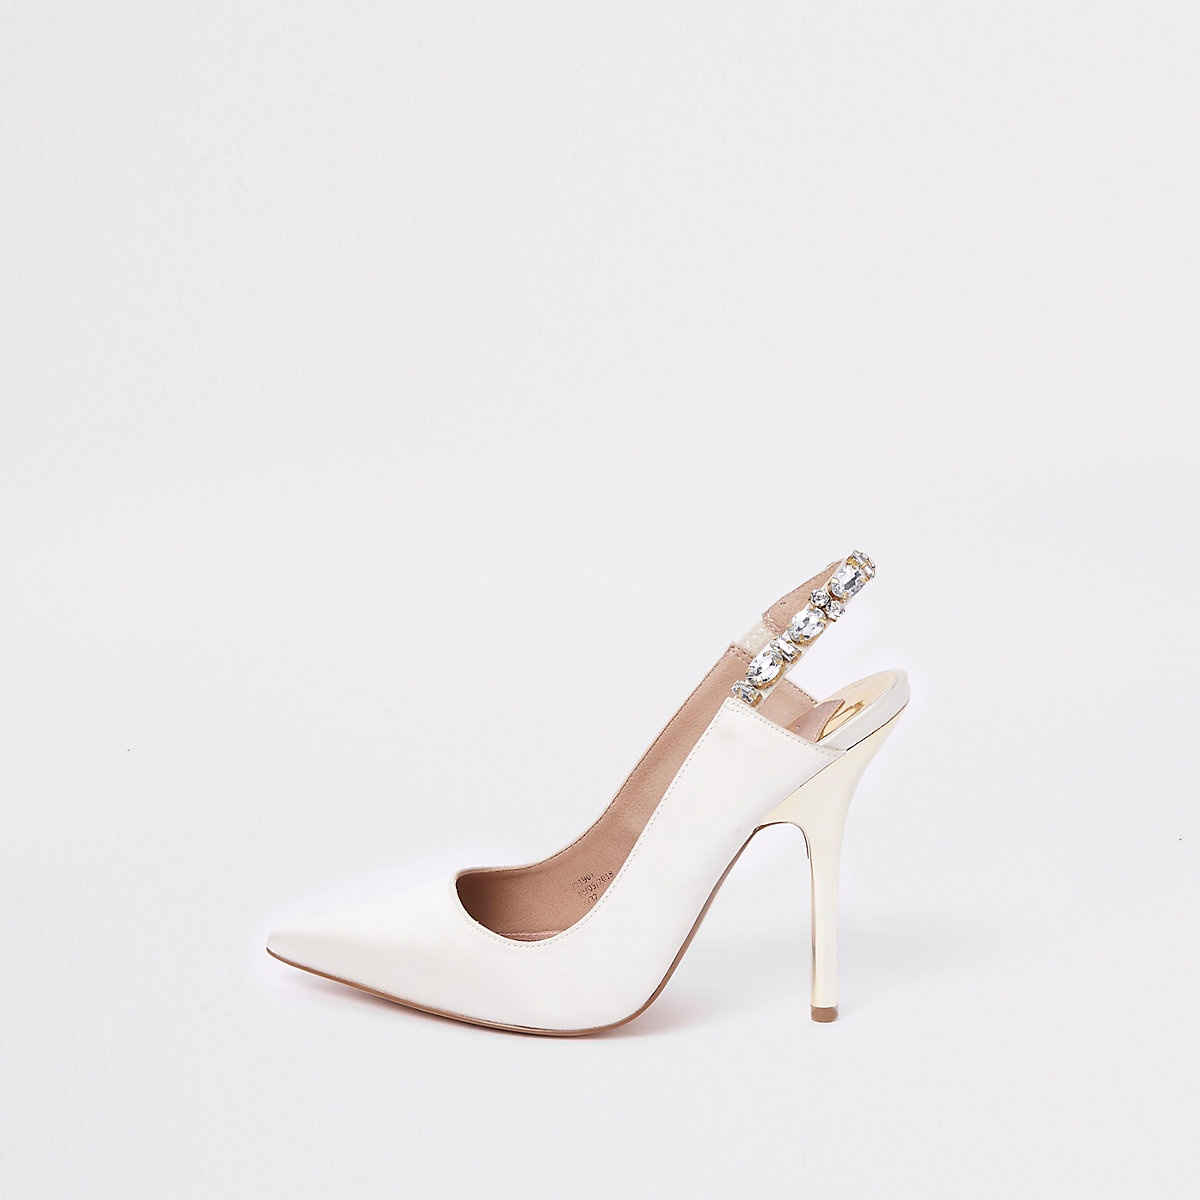 White thin heel sling back pumps